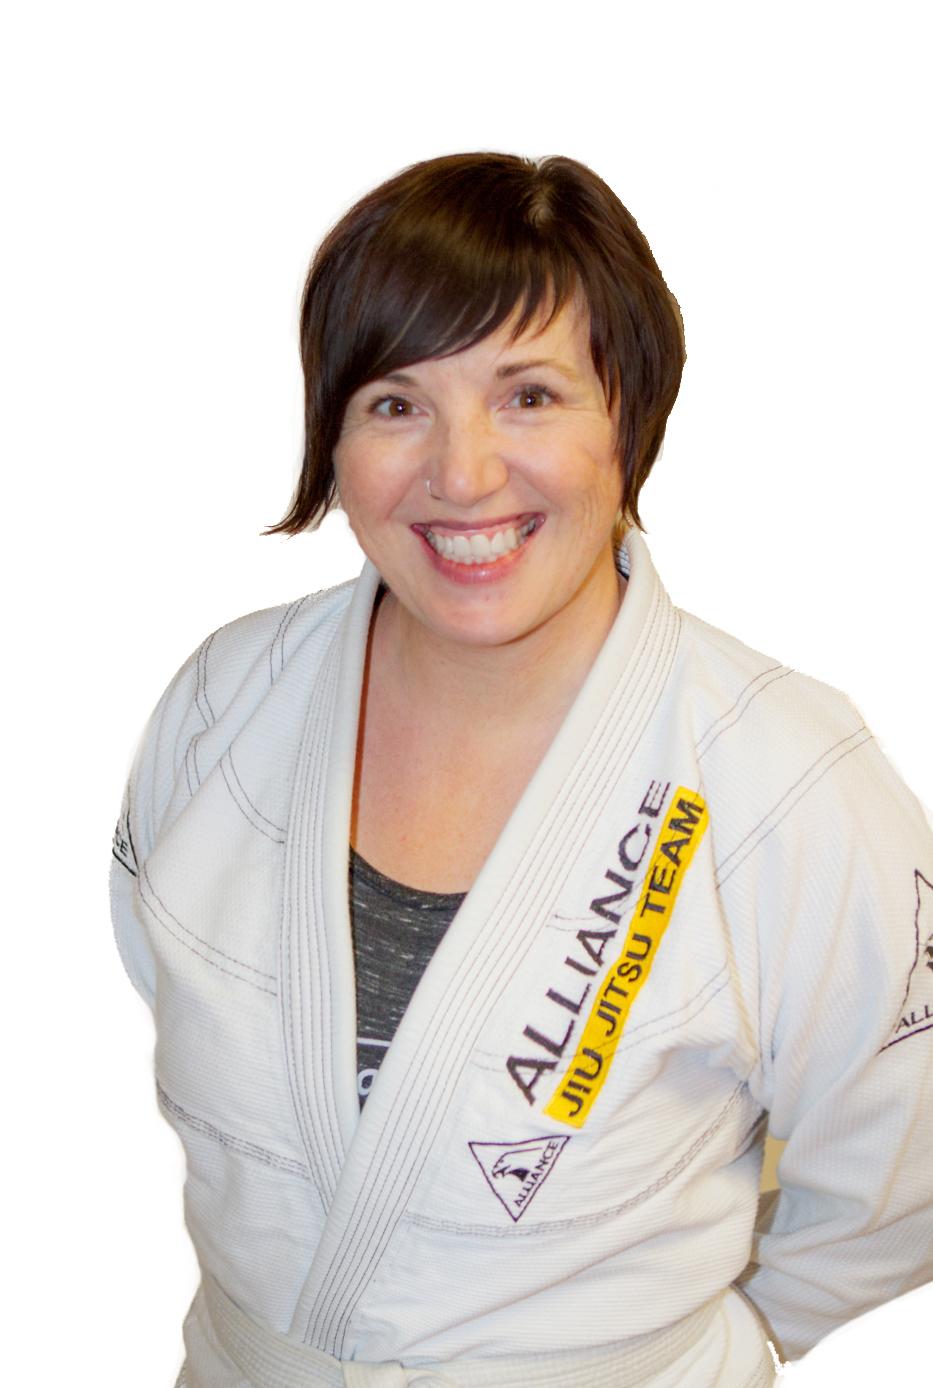 Melissa McHugh